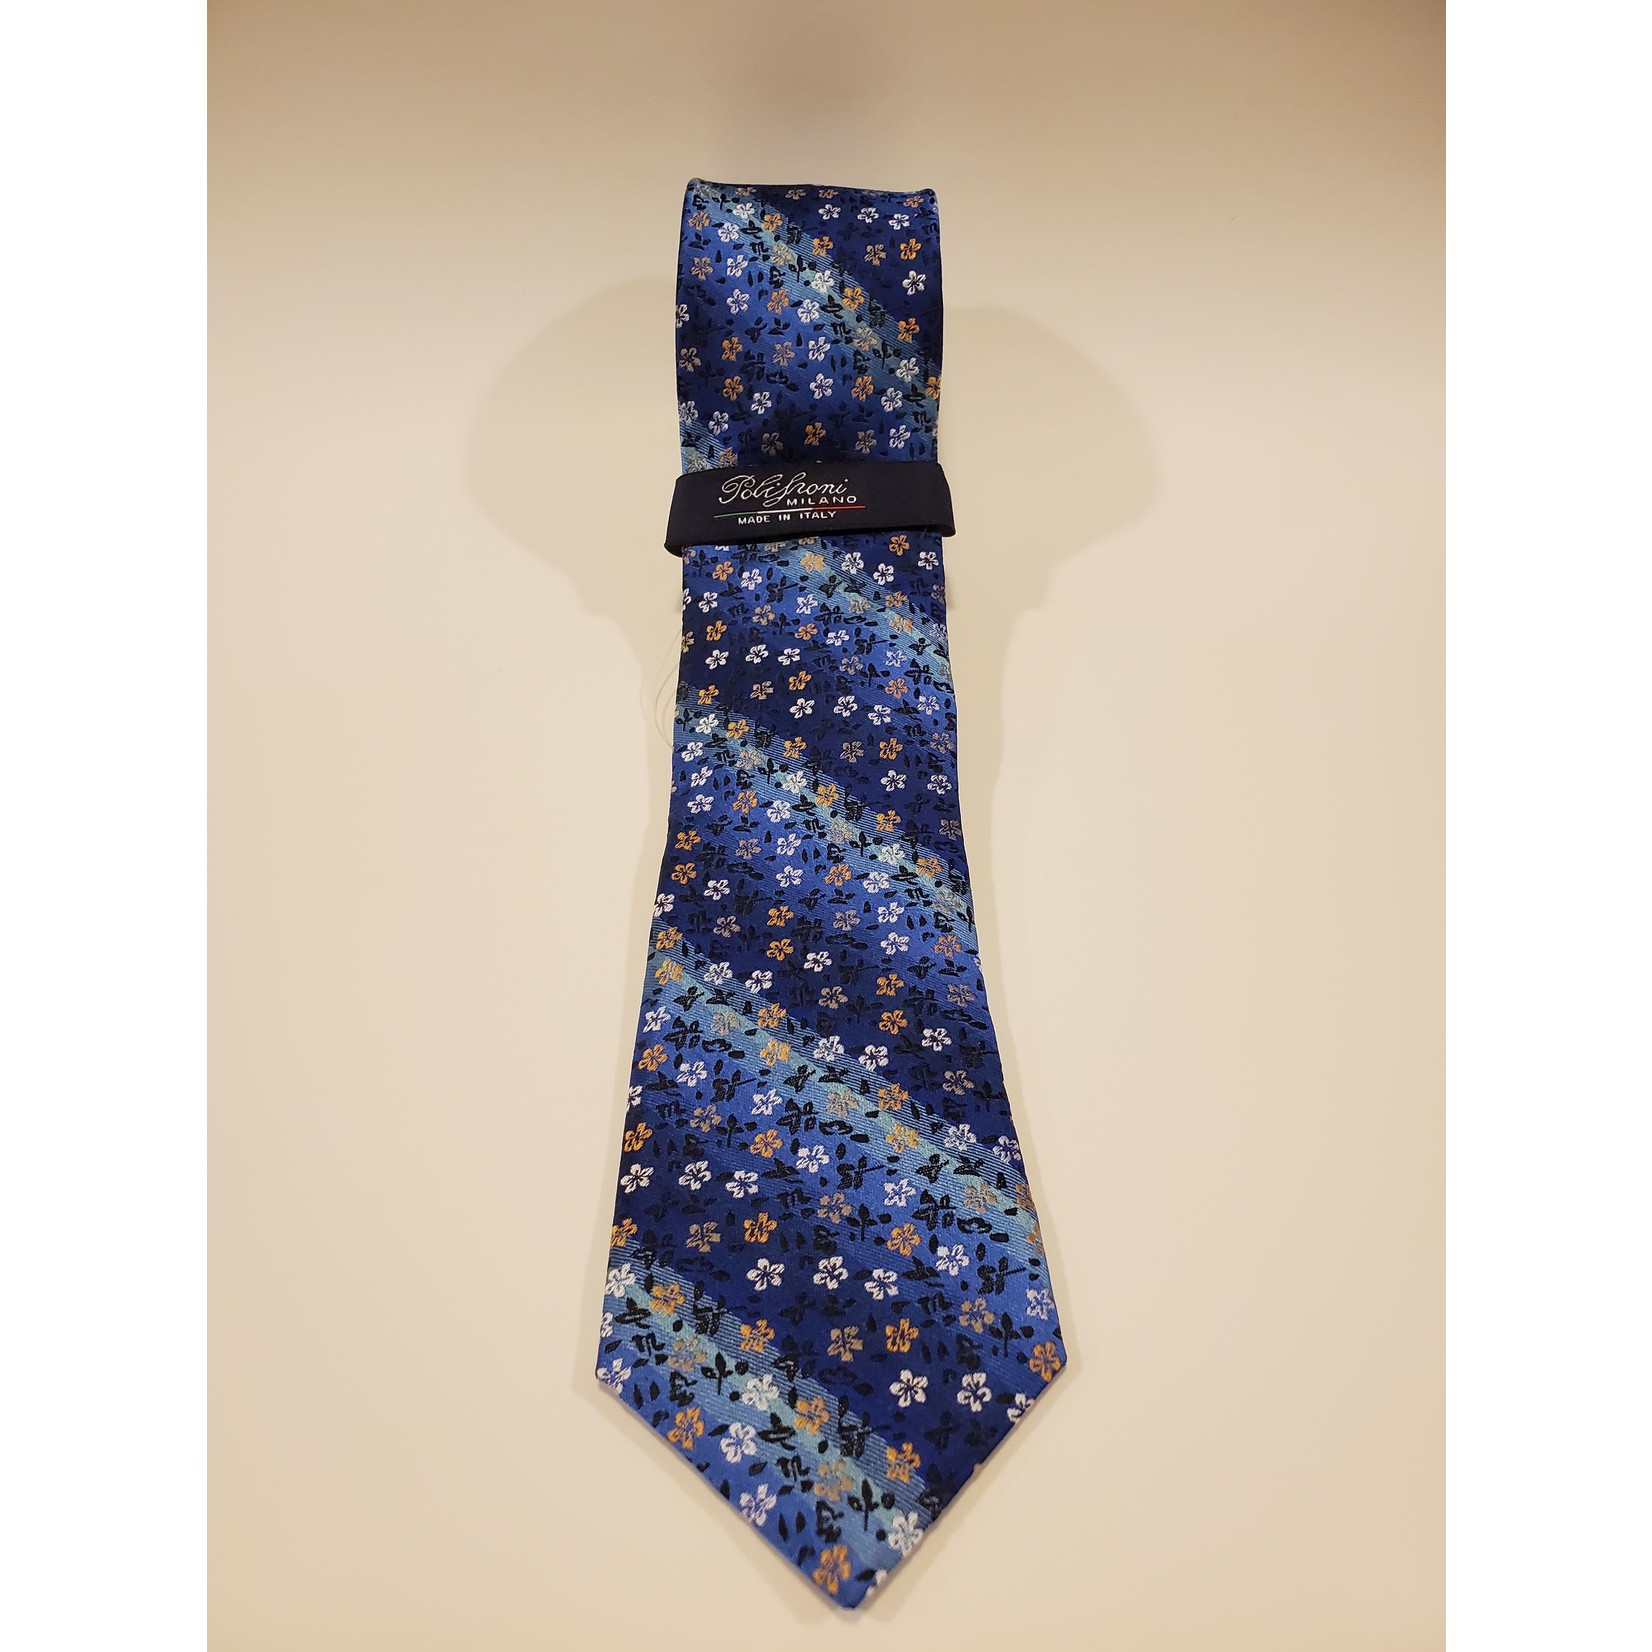 Polifroni Polifroni 211905 Jacquard Micro Floral Pattern Silk Tie